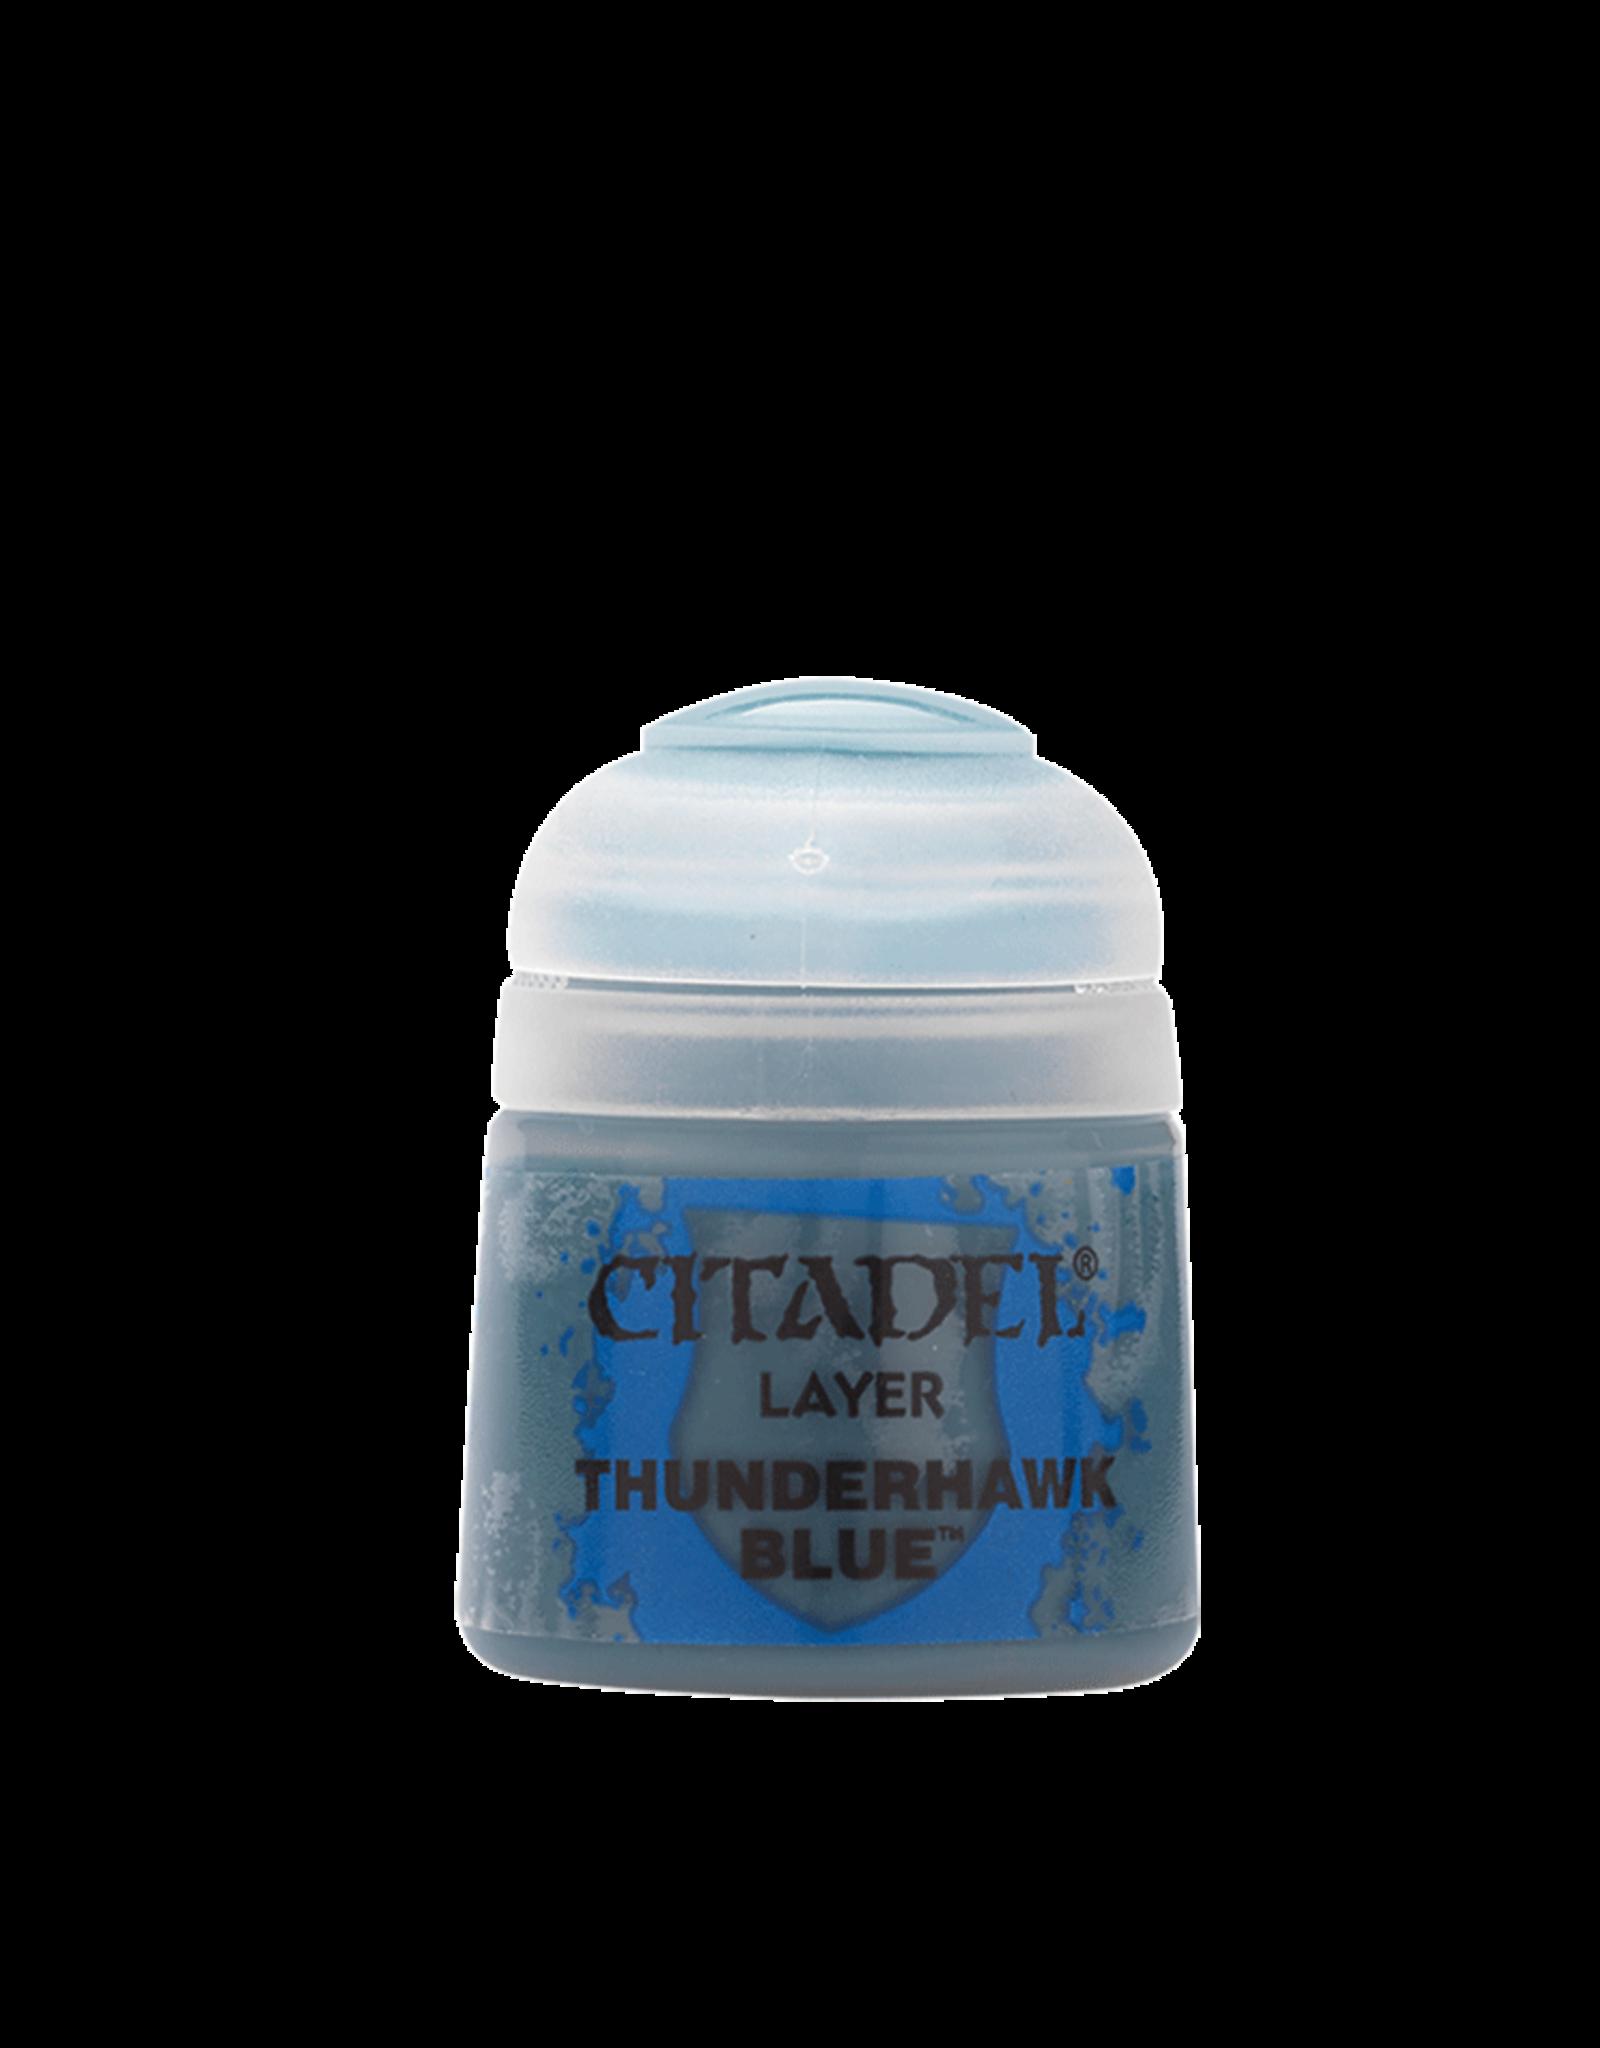 Games Workshop Citadel Layer: Thunderhawk Blue